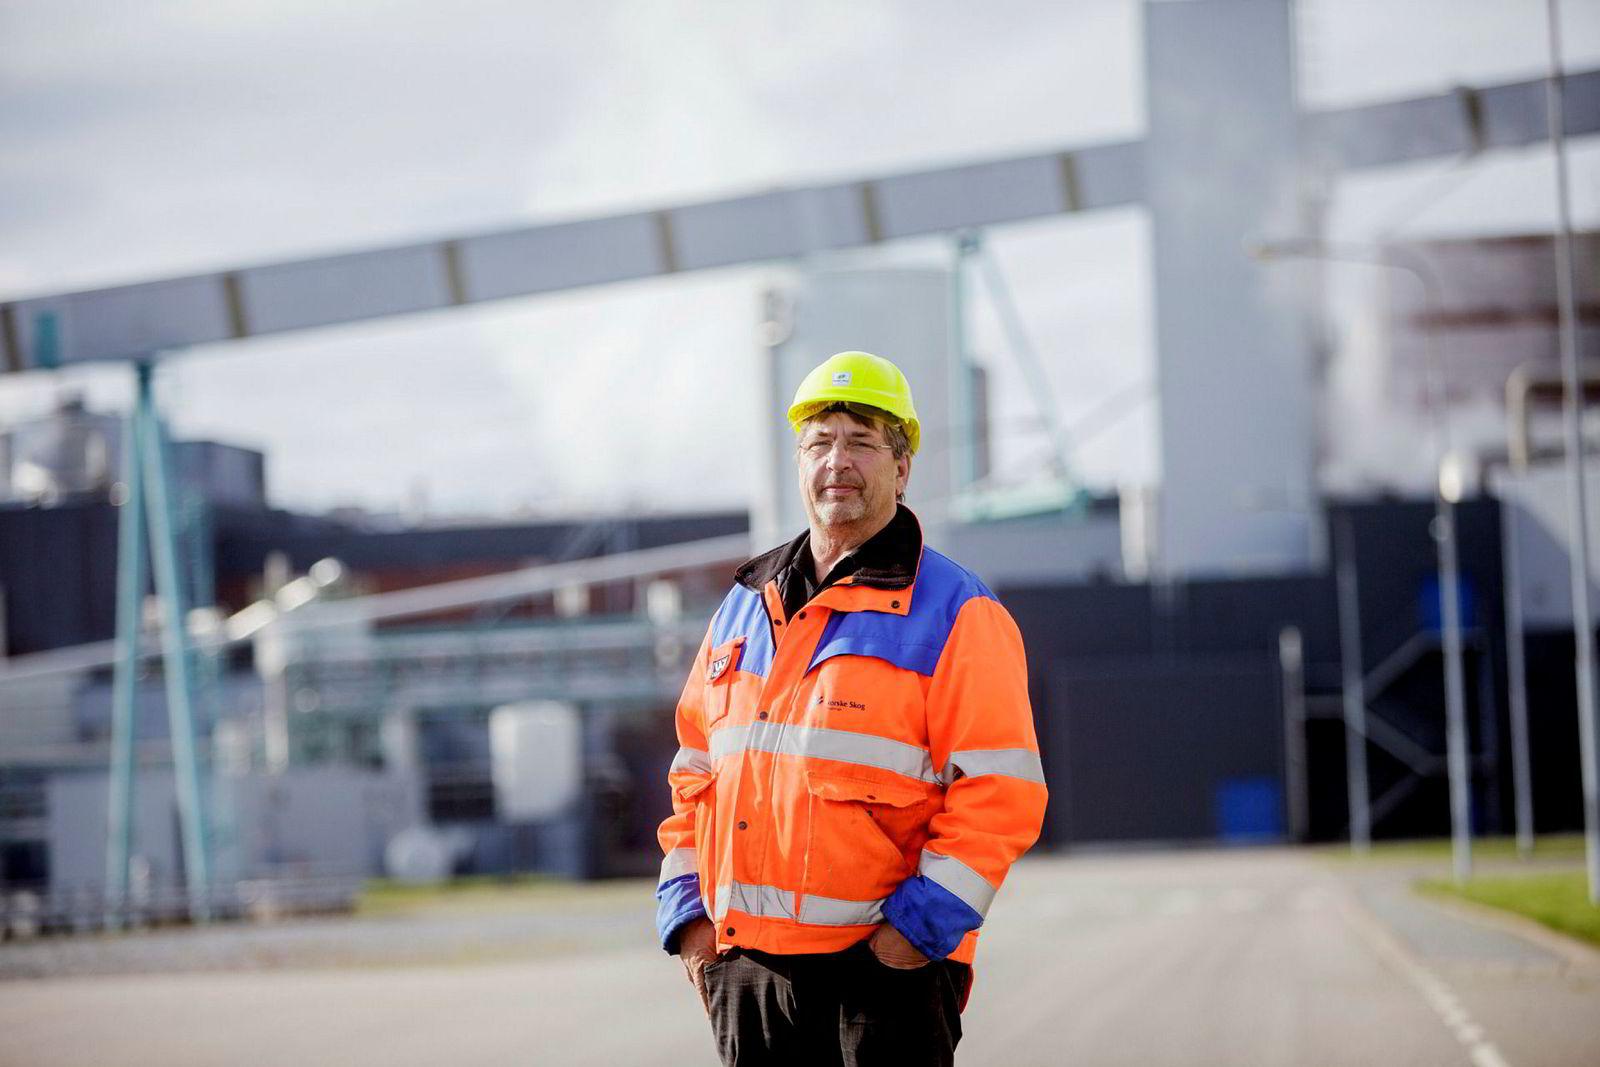 – Det er de med dårligst konkurransekraft som vil ryke først, sier hovedtillitsvalgt Paul Kristiansen ved Norske Skog Saugbrugs.